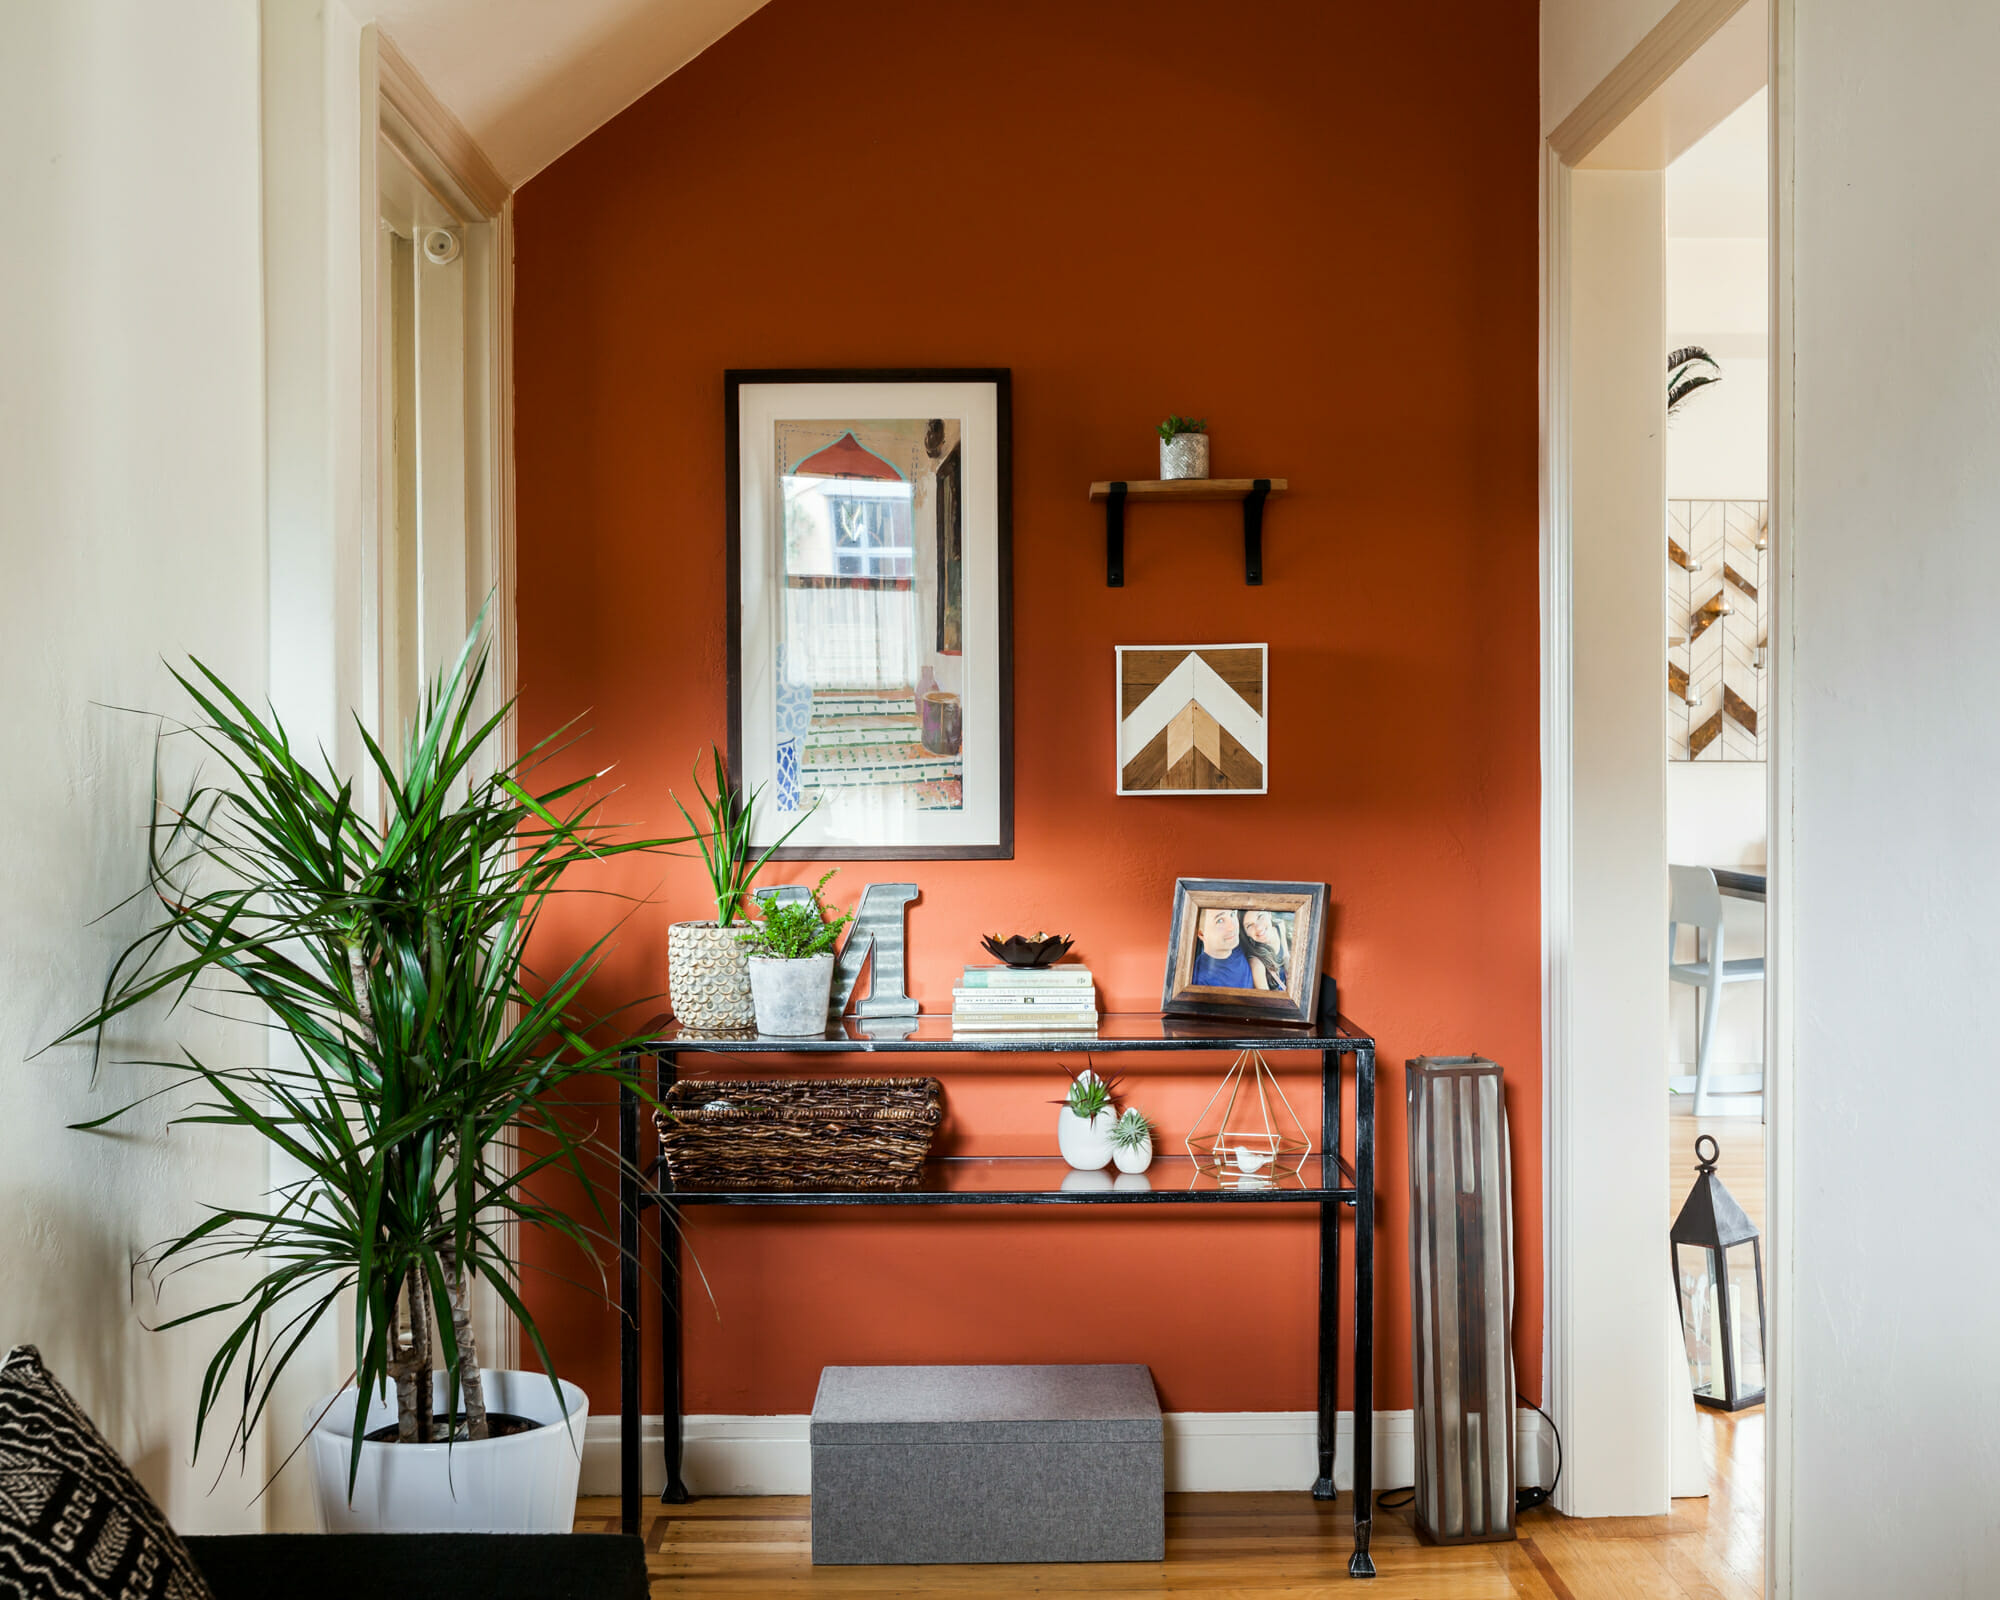 Entryway design in burnt orange fall color theme by Decorilla designer, Christine M.